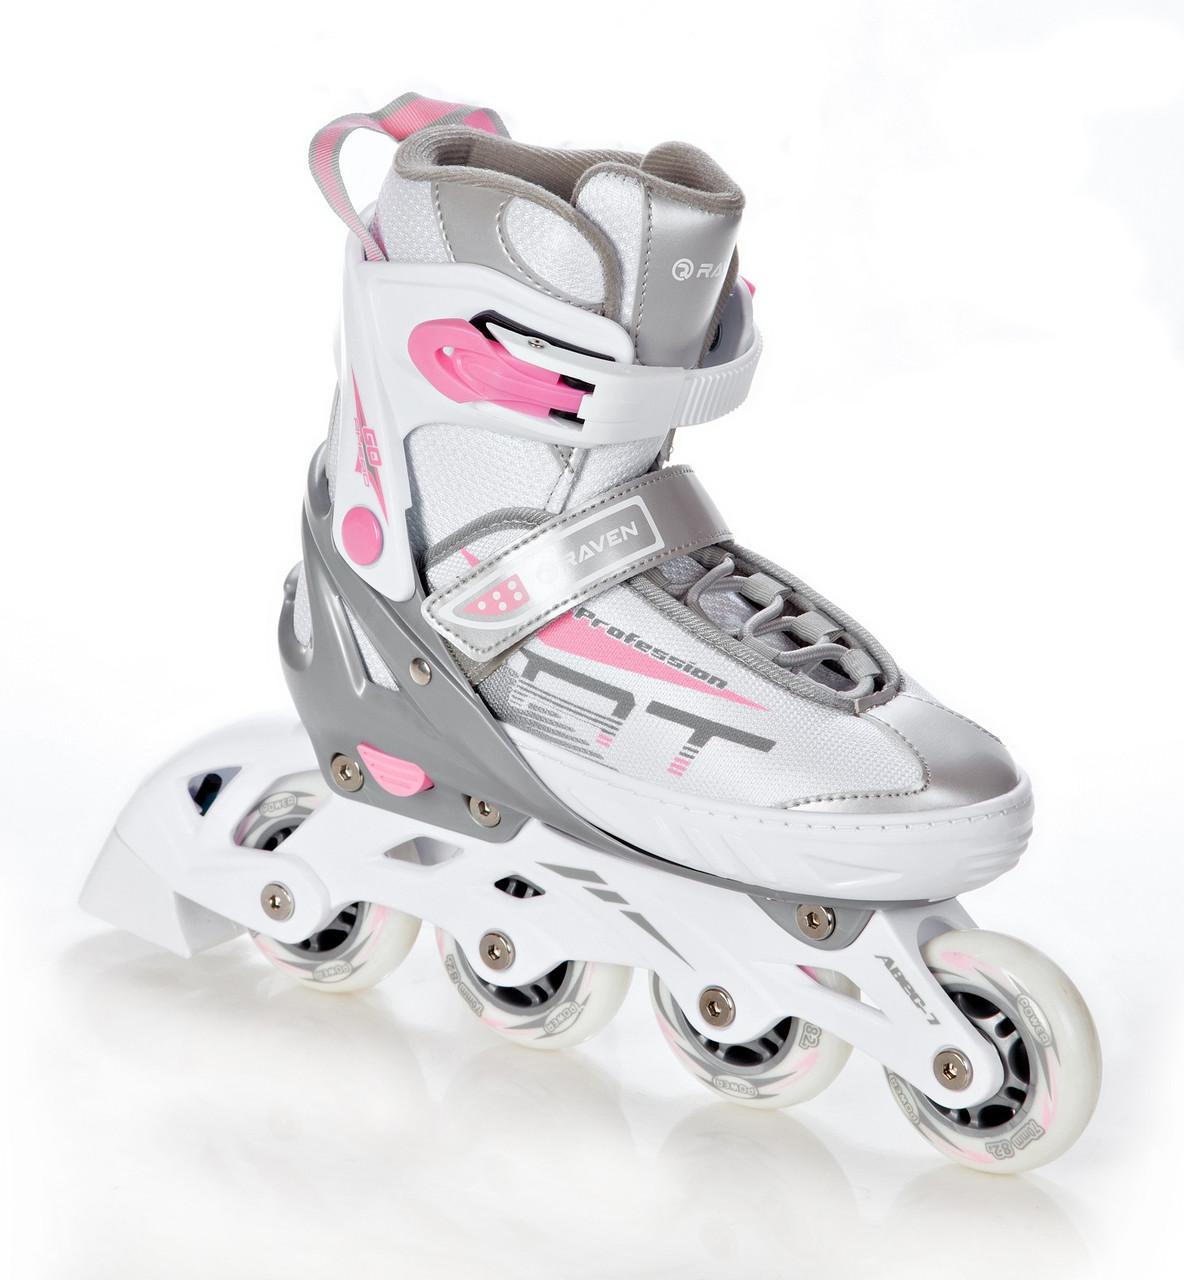 Роликовые коньки Raven Profession Style White/Pink